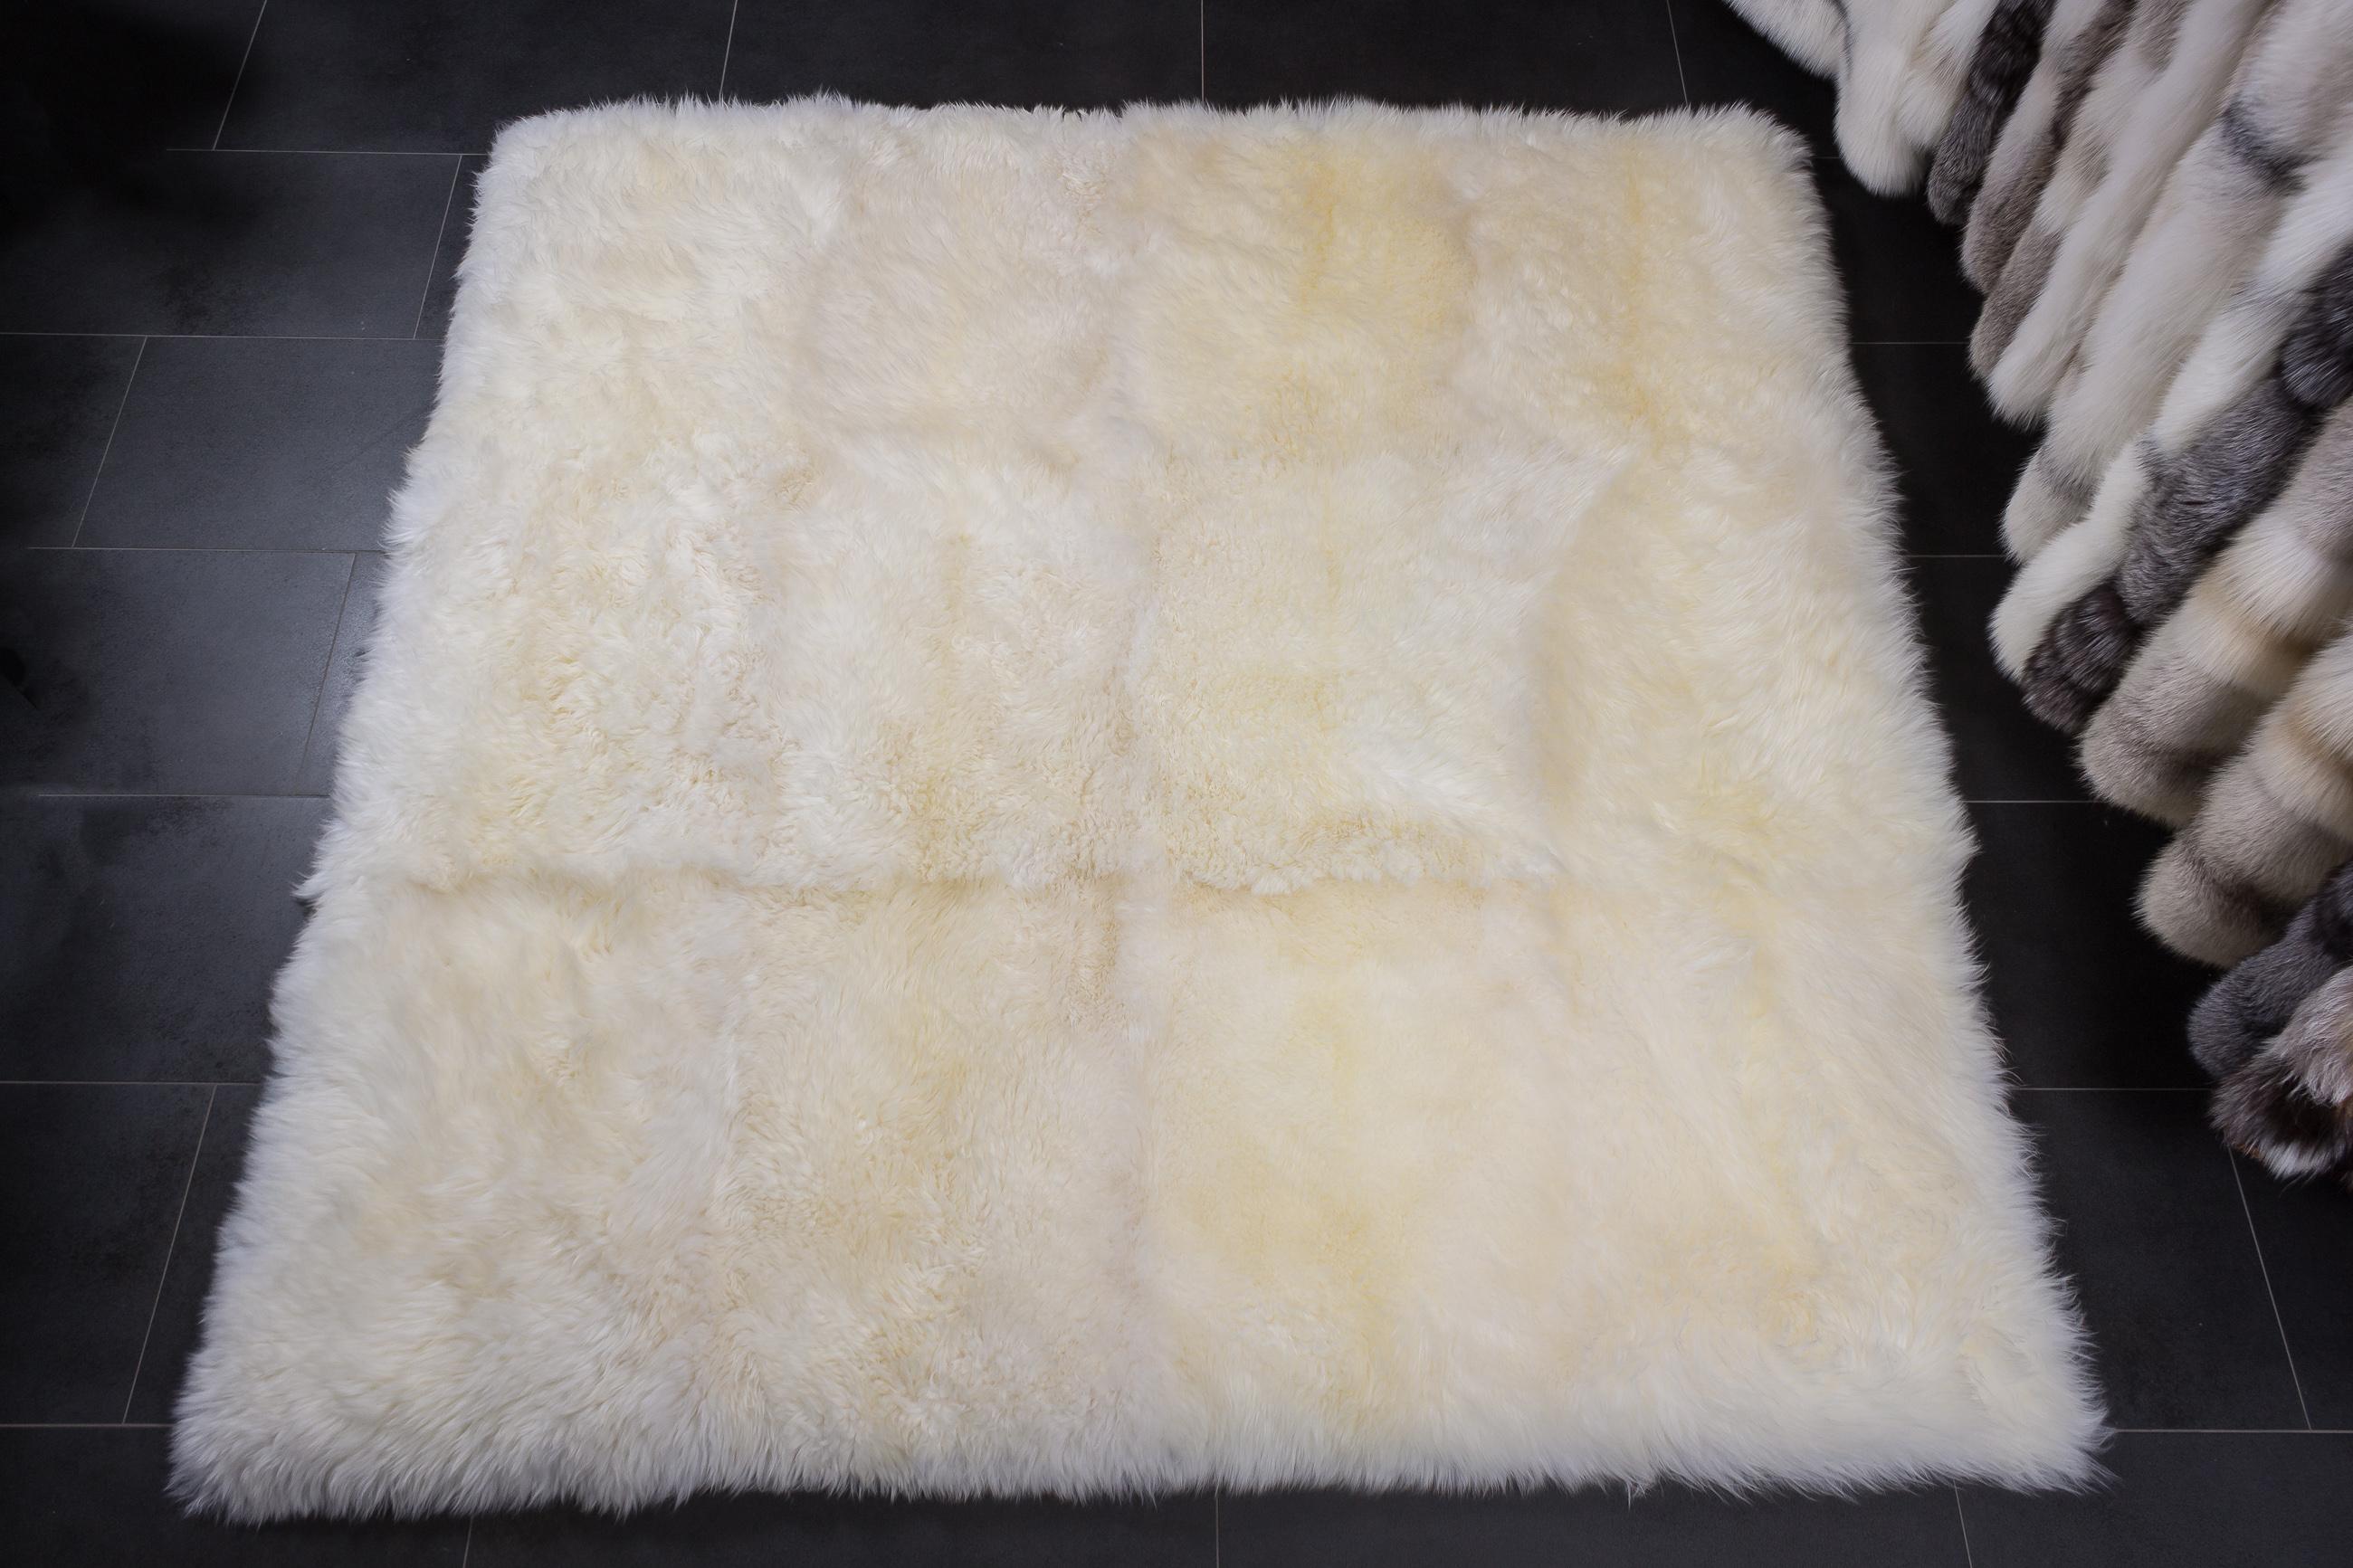 label saga furrier lamb silver master fur with fox pillow